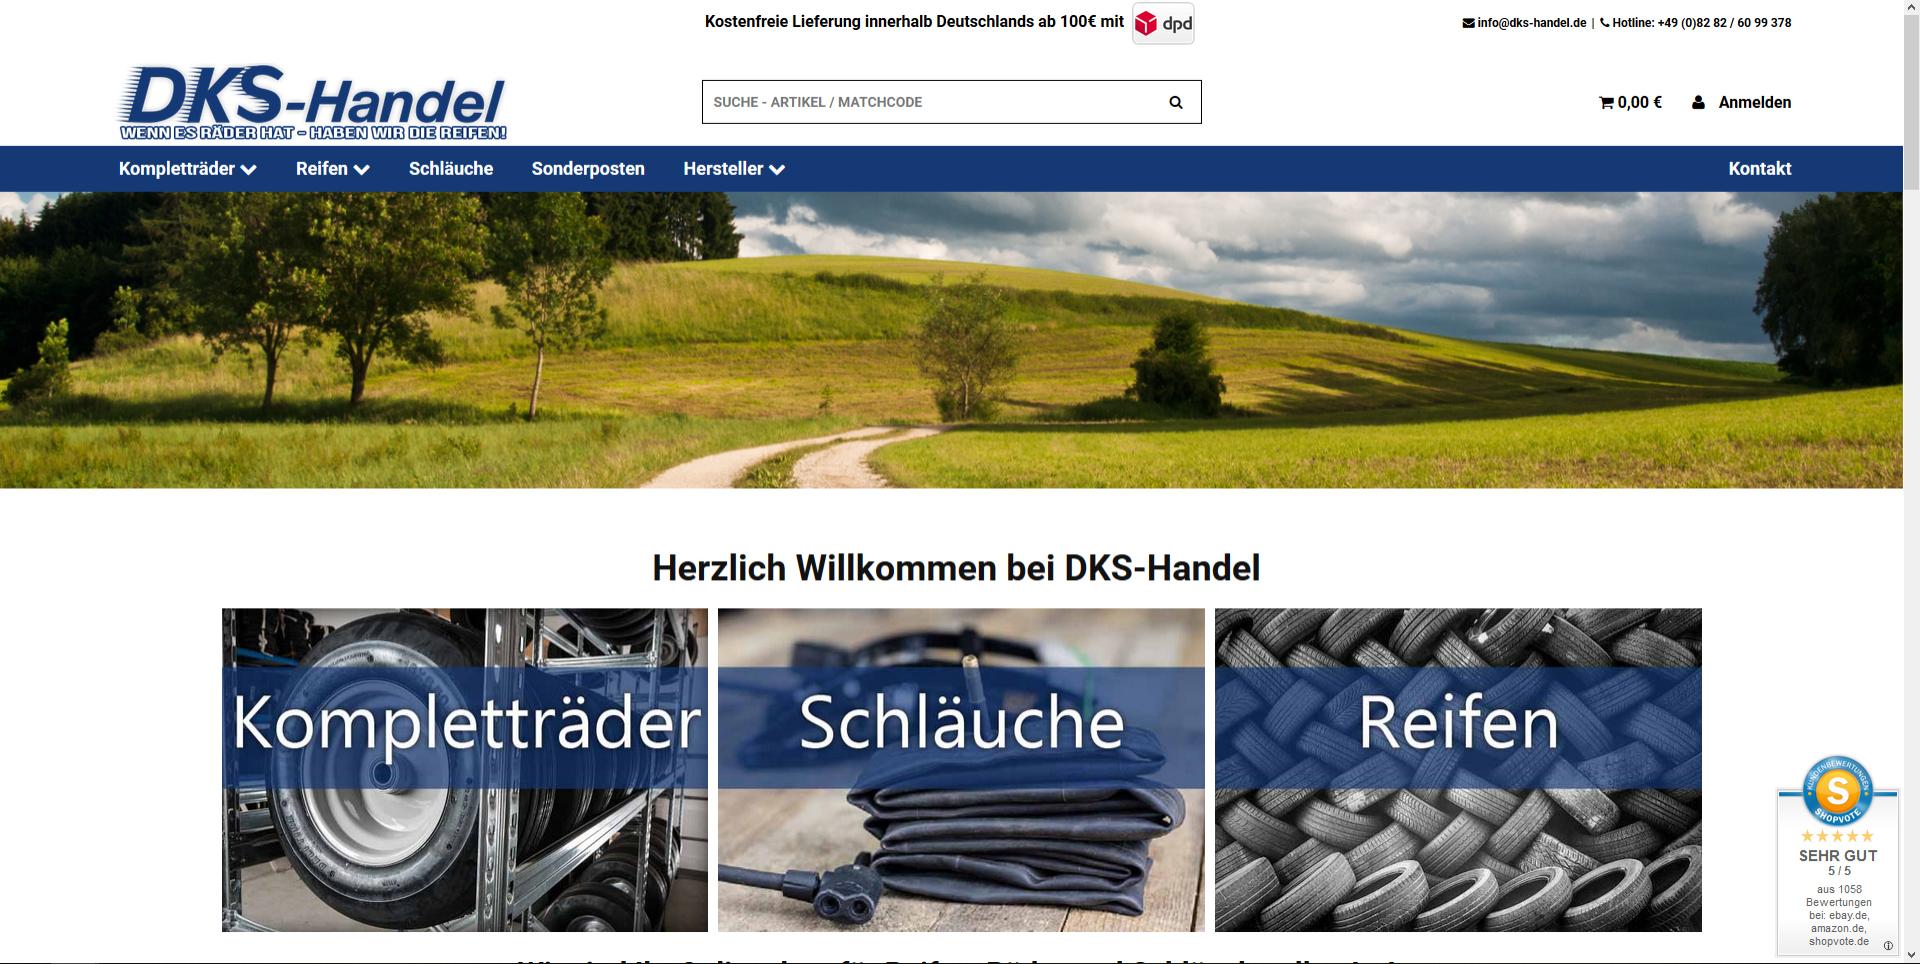 DKS-Handel